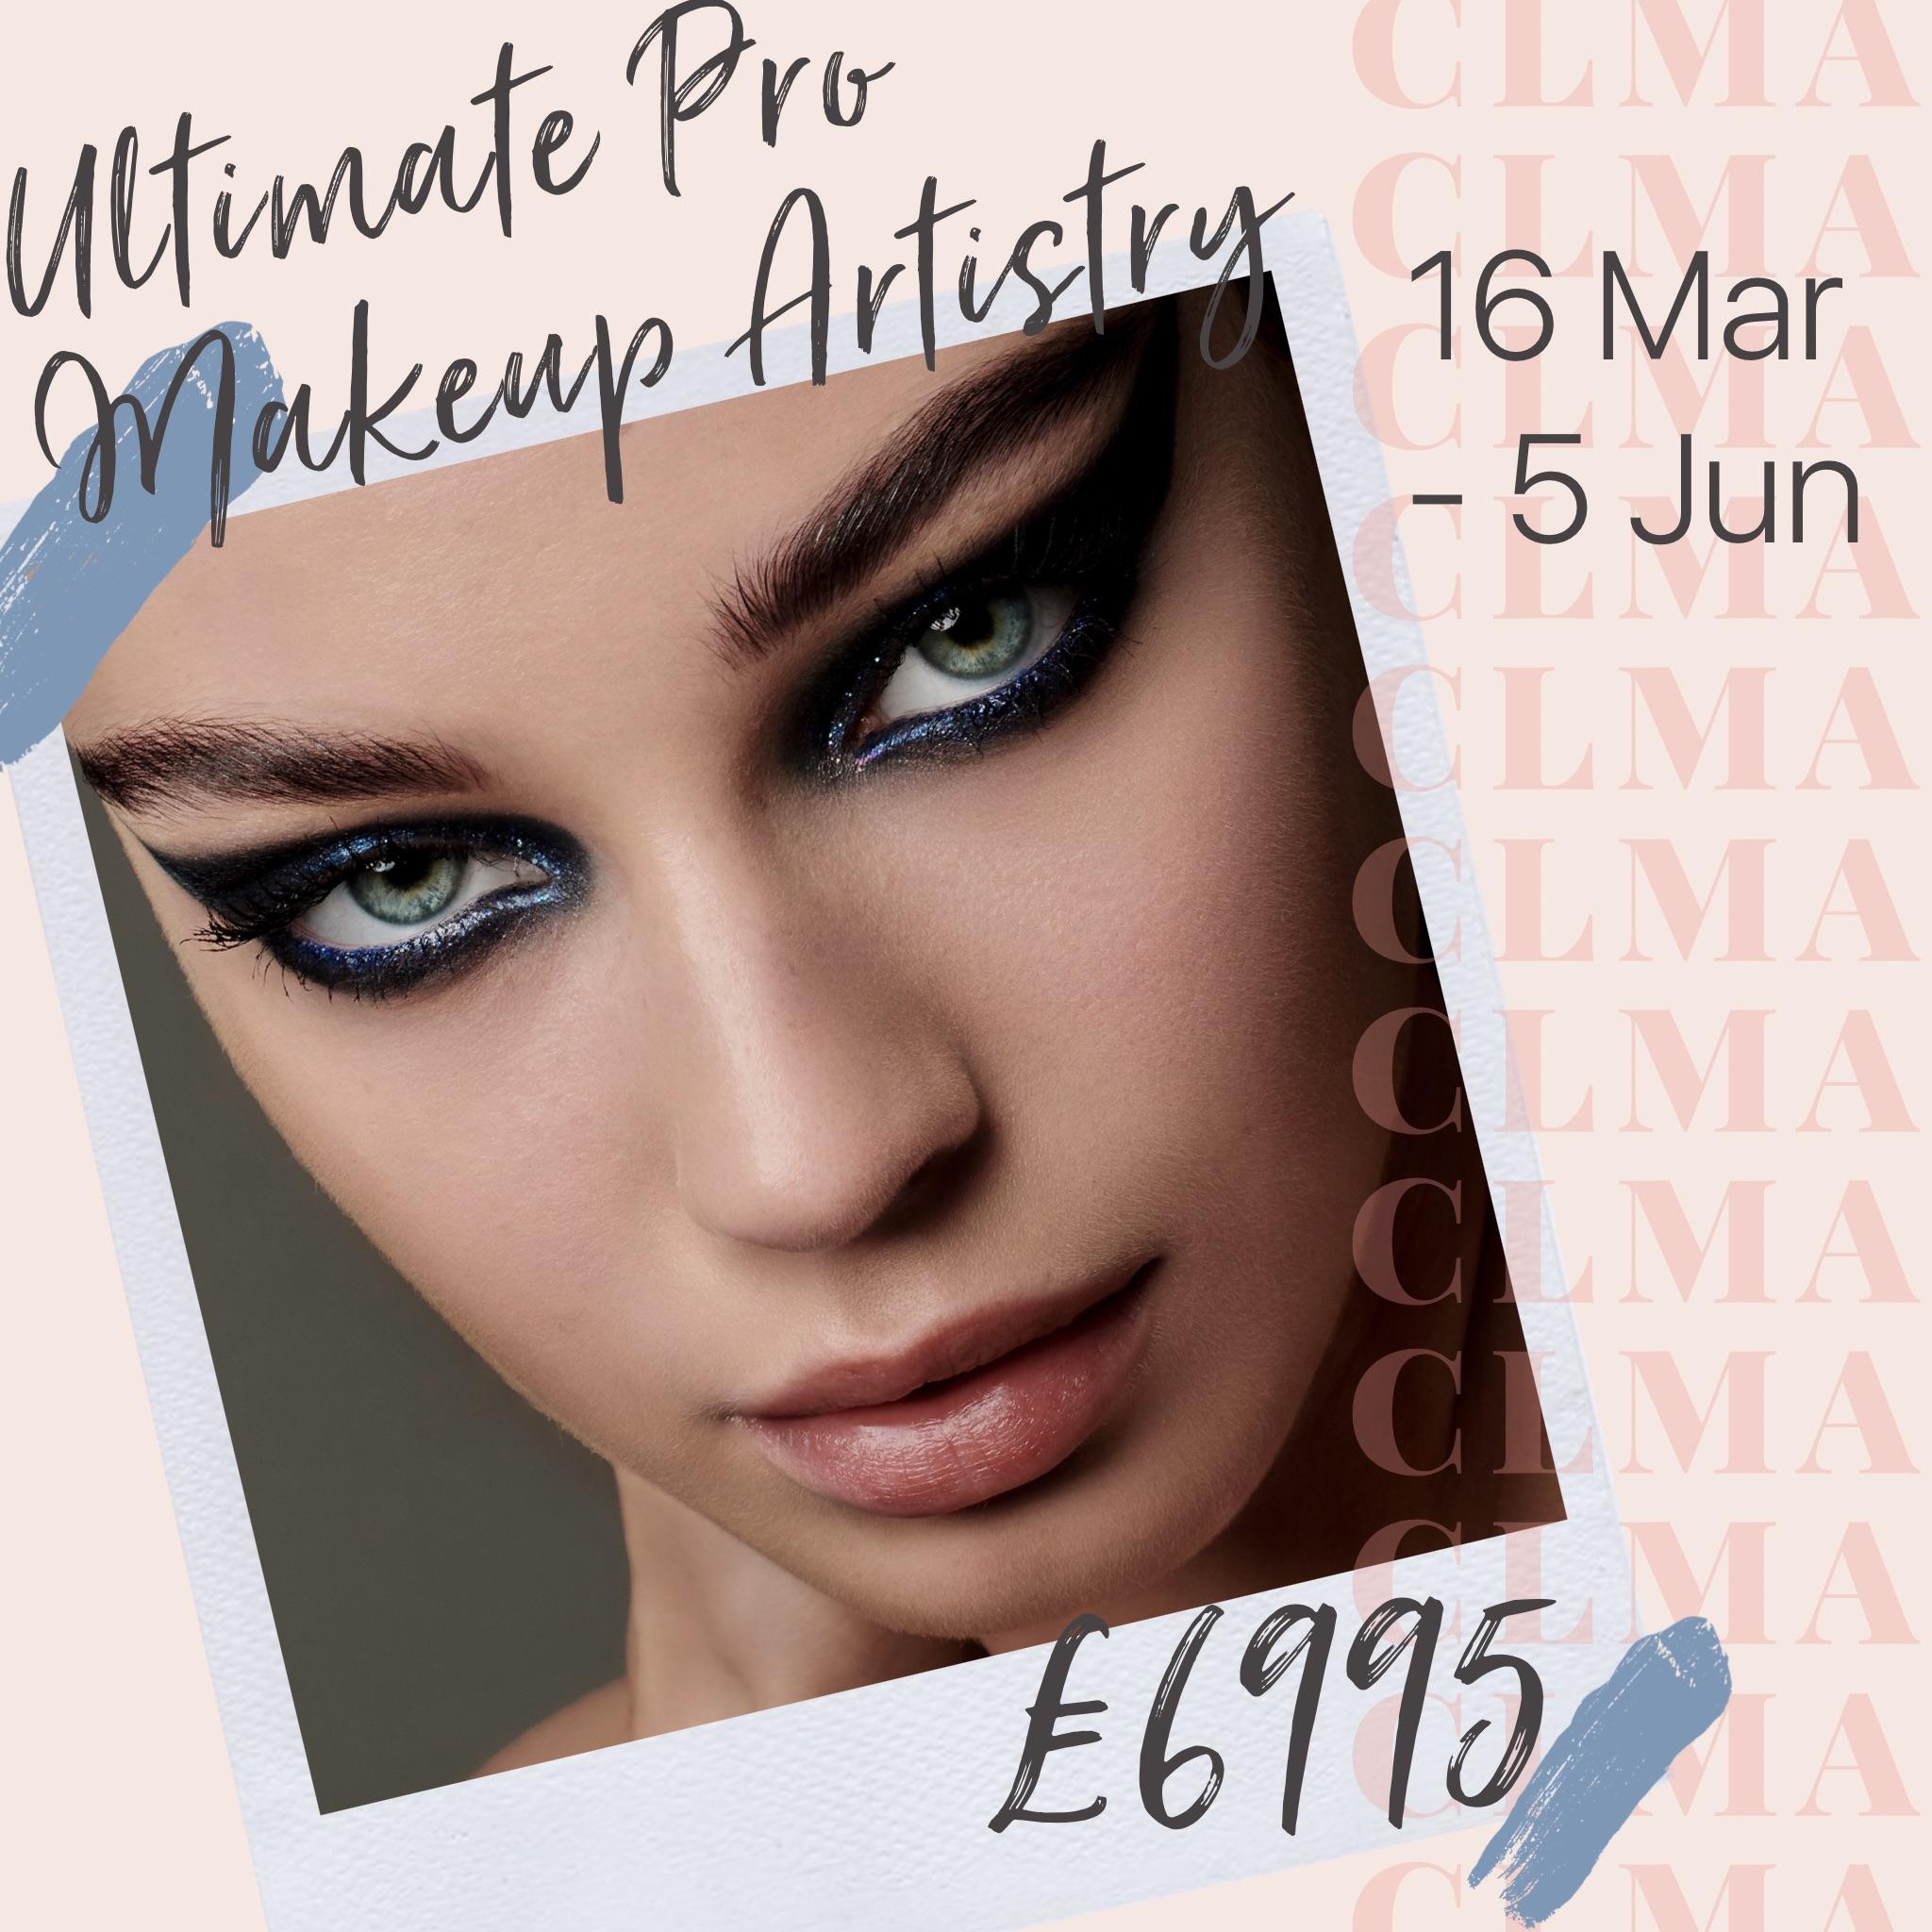 Ultimate Pro Makeup Artistry Makeup Course